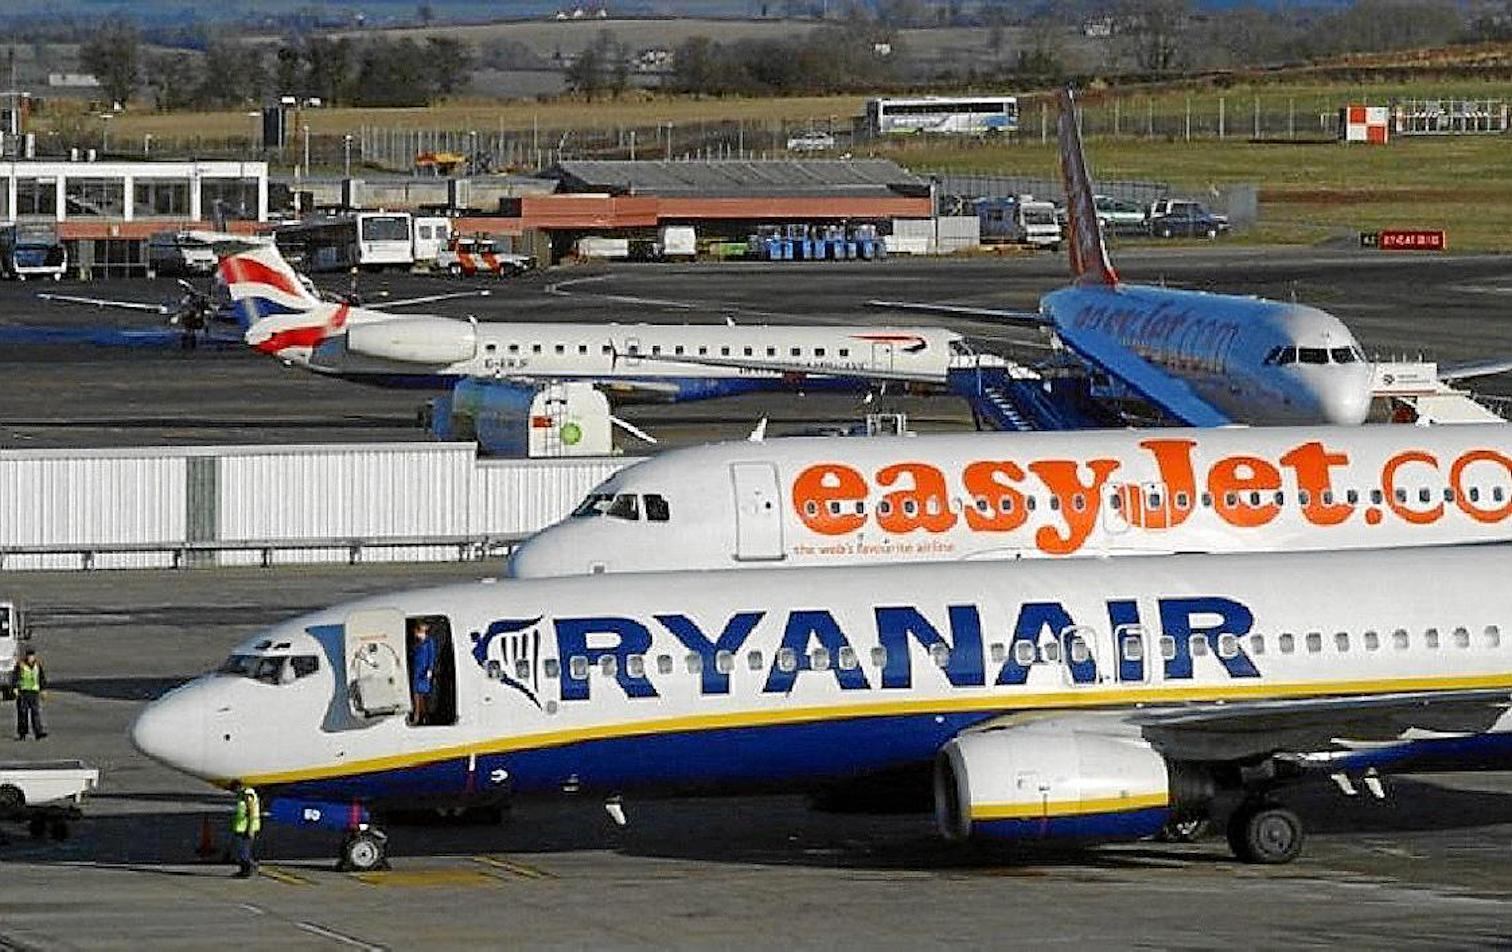 Ryanair, TUI, BA & Easyjet planes at Palma Airport.